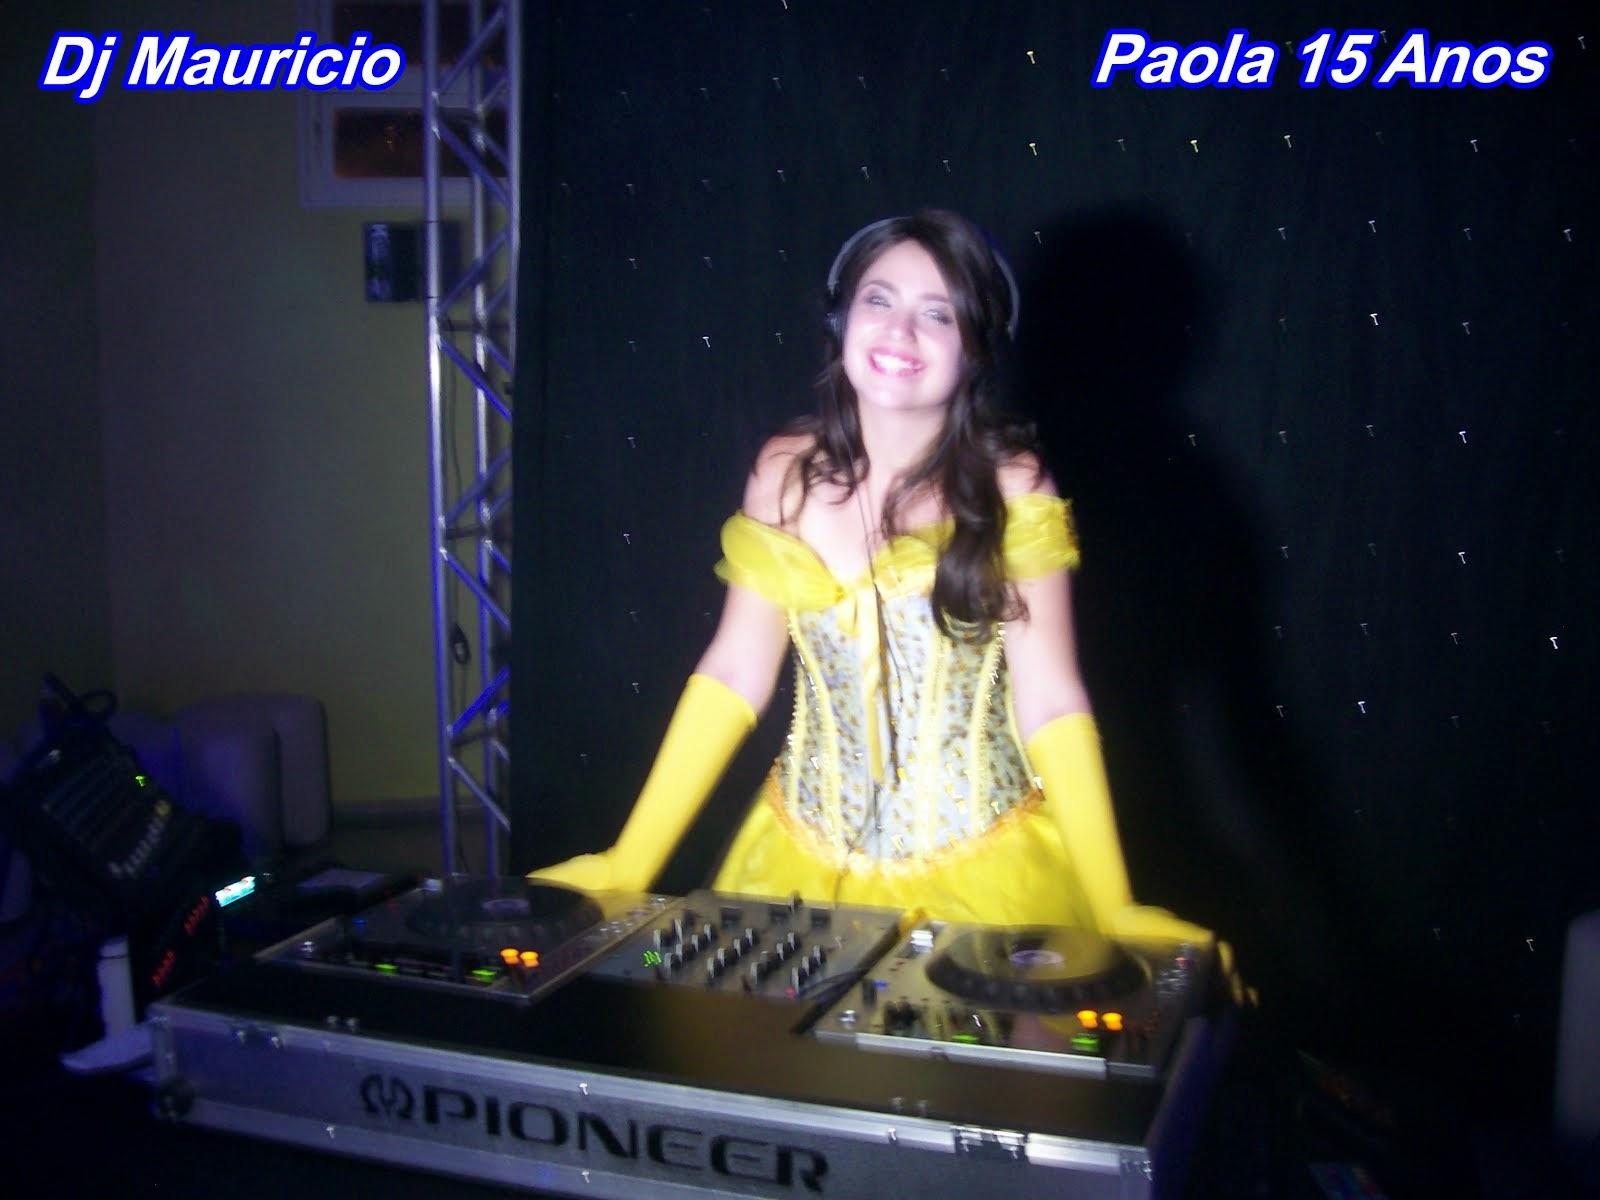 Paola 15 Anos